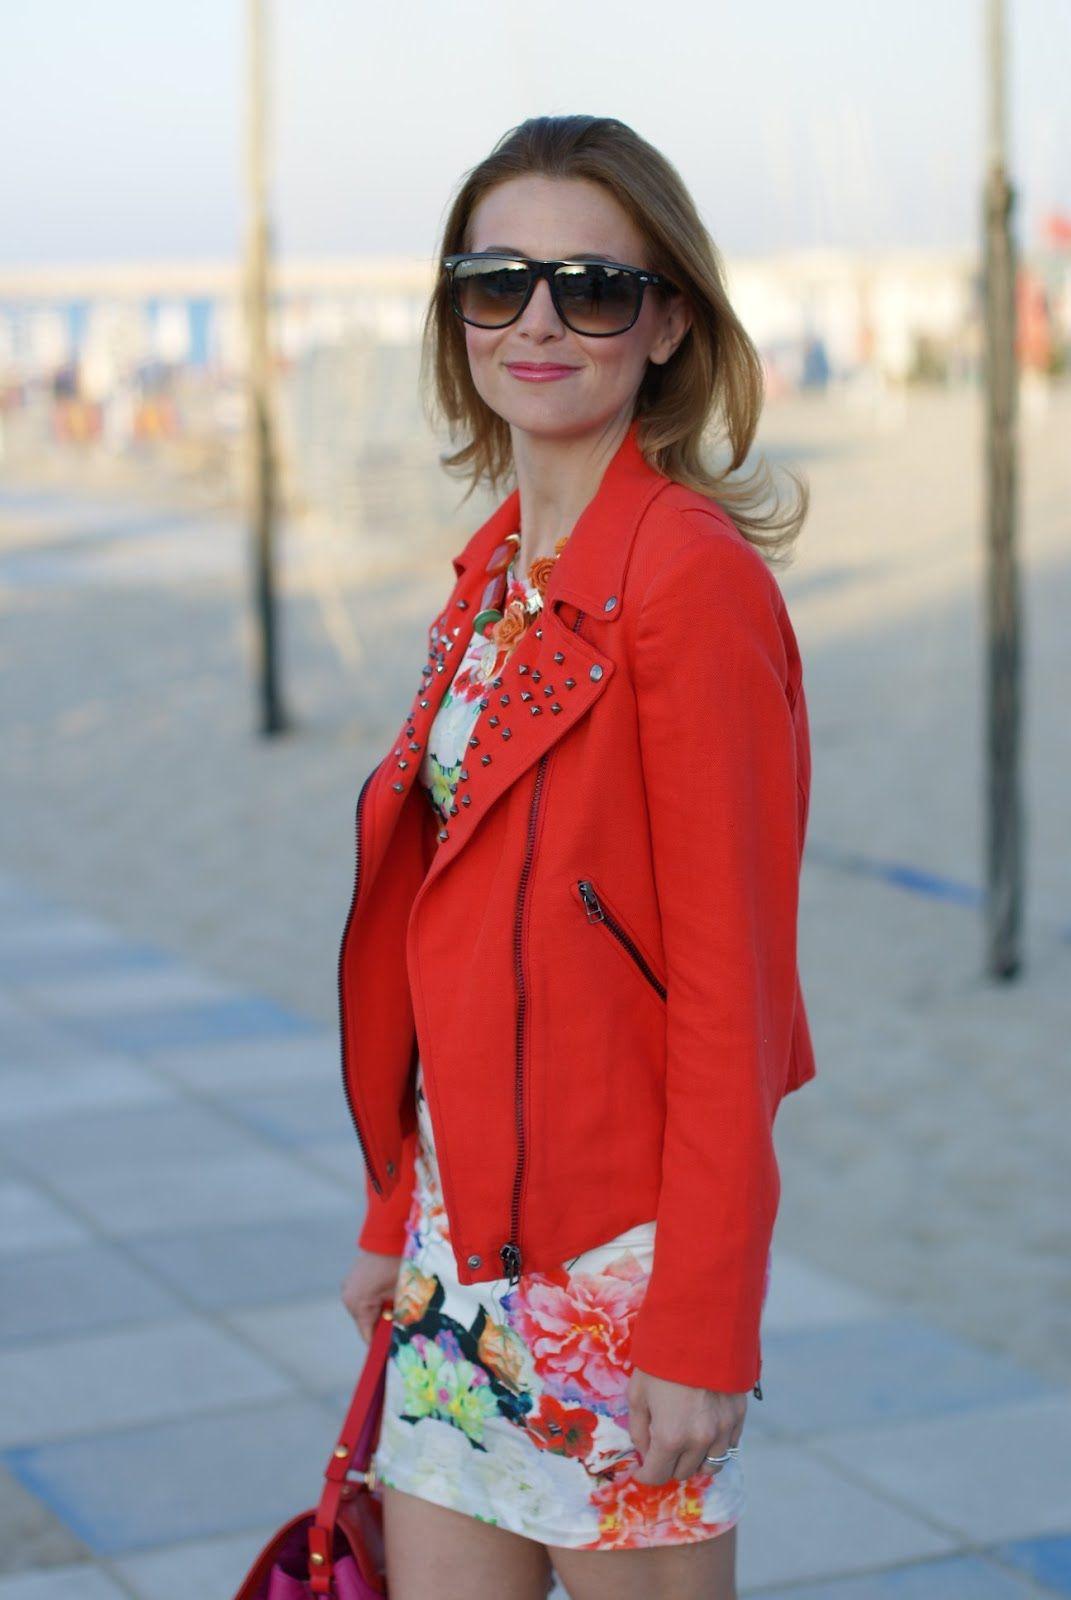 Zara linen studded jacket, tight floral dress, Fornarina shoes, Marc Jacobs bag